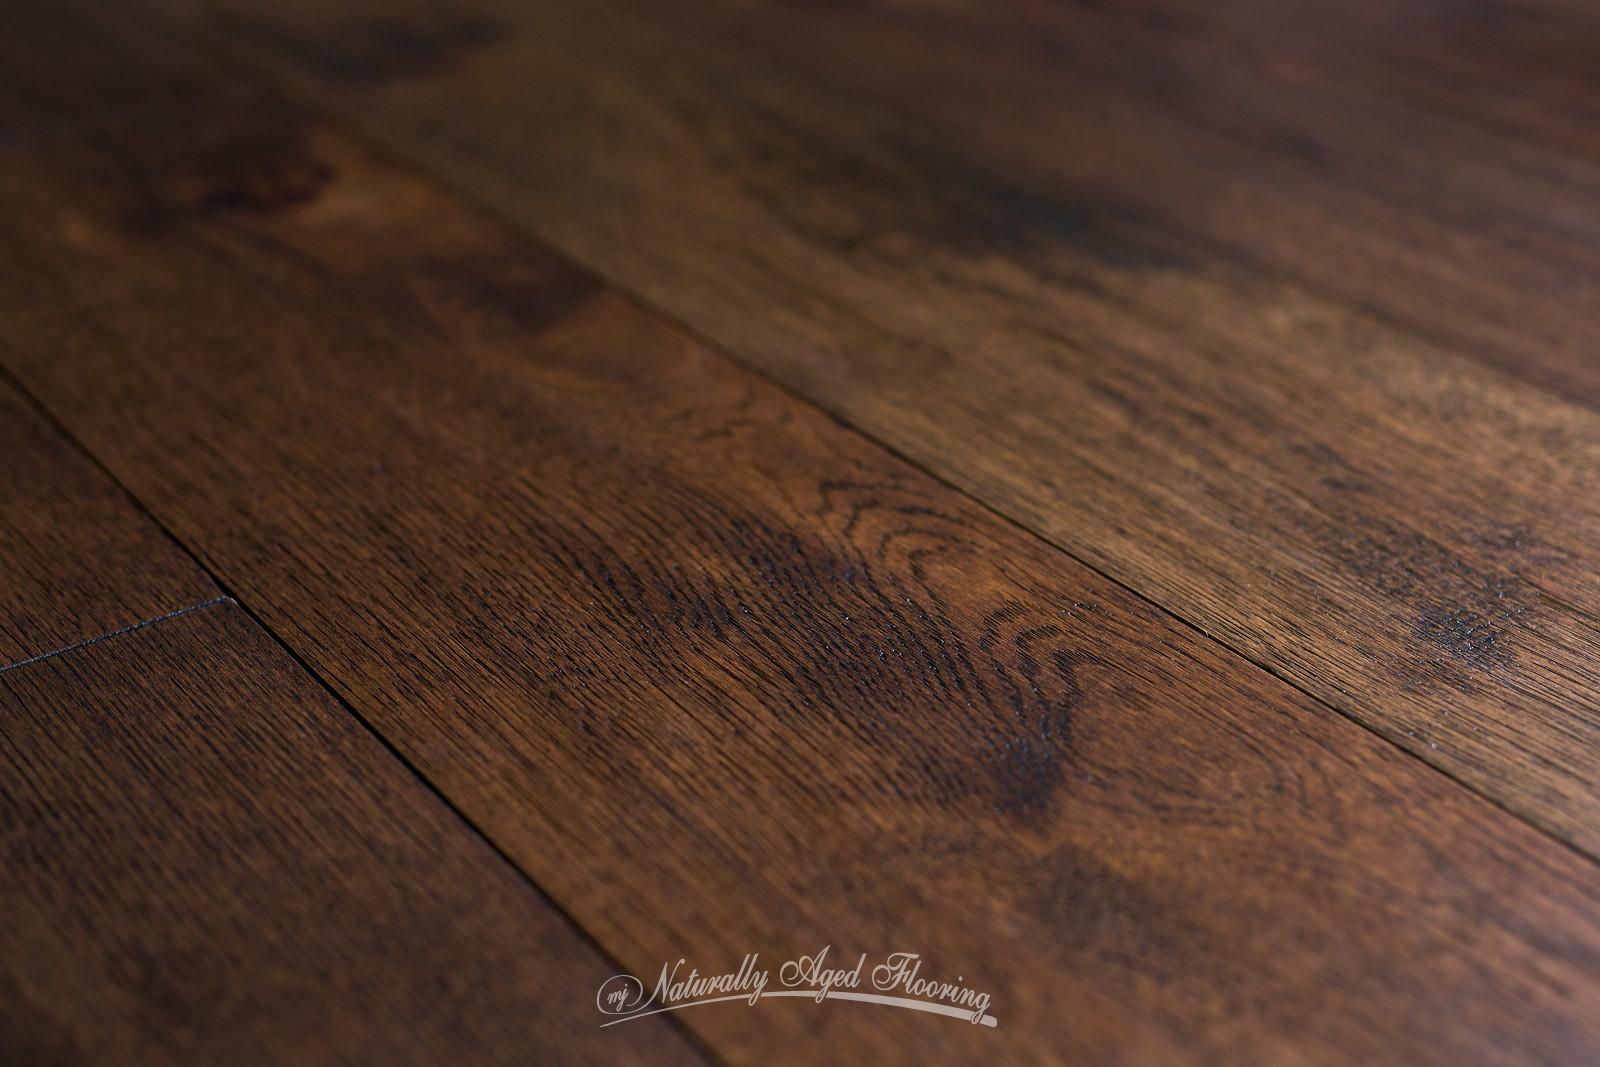 Medallion Collection Naturally Aged Flooring - Medallion flooring distributor